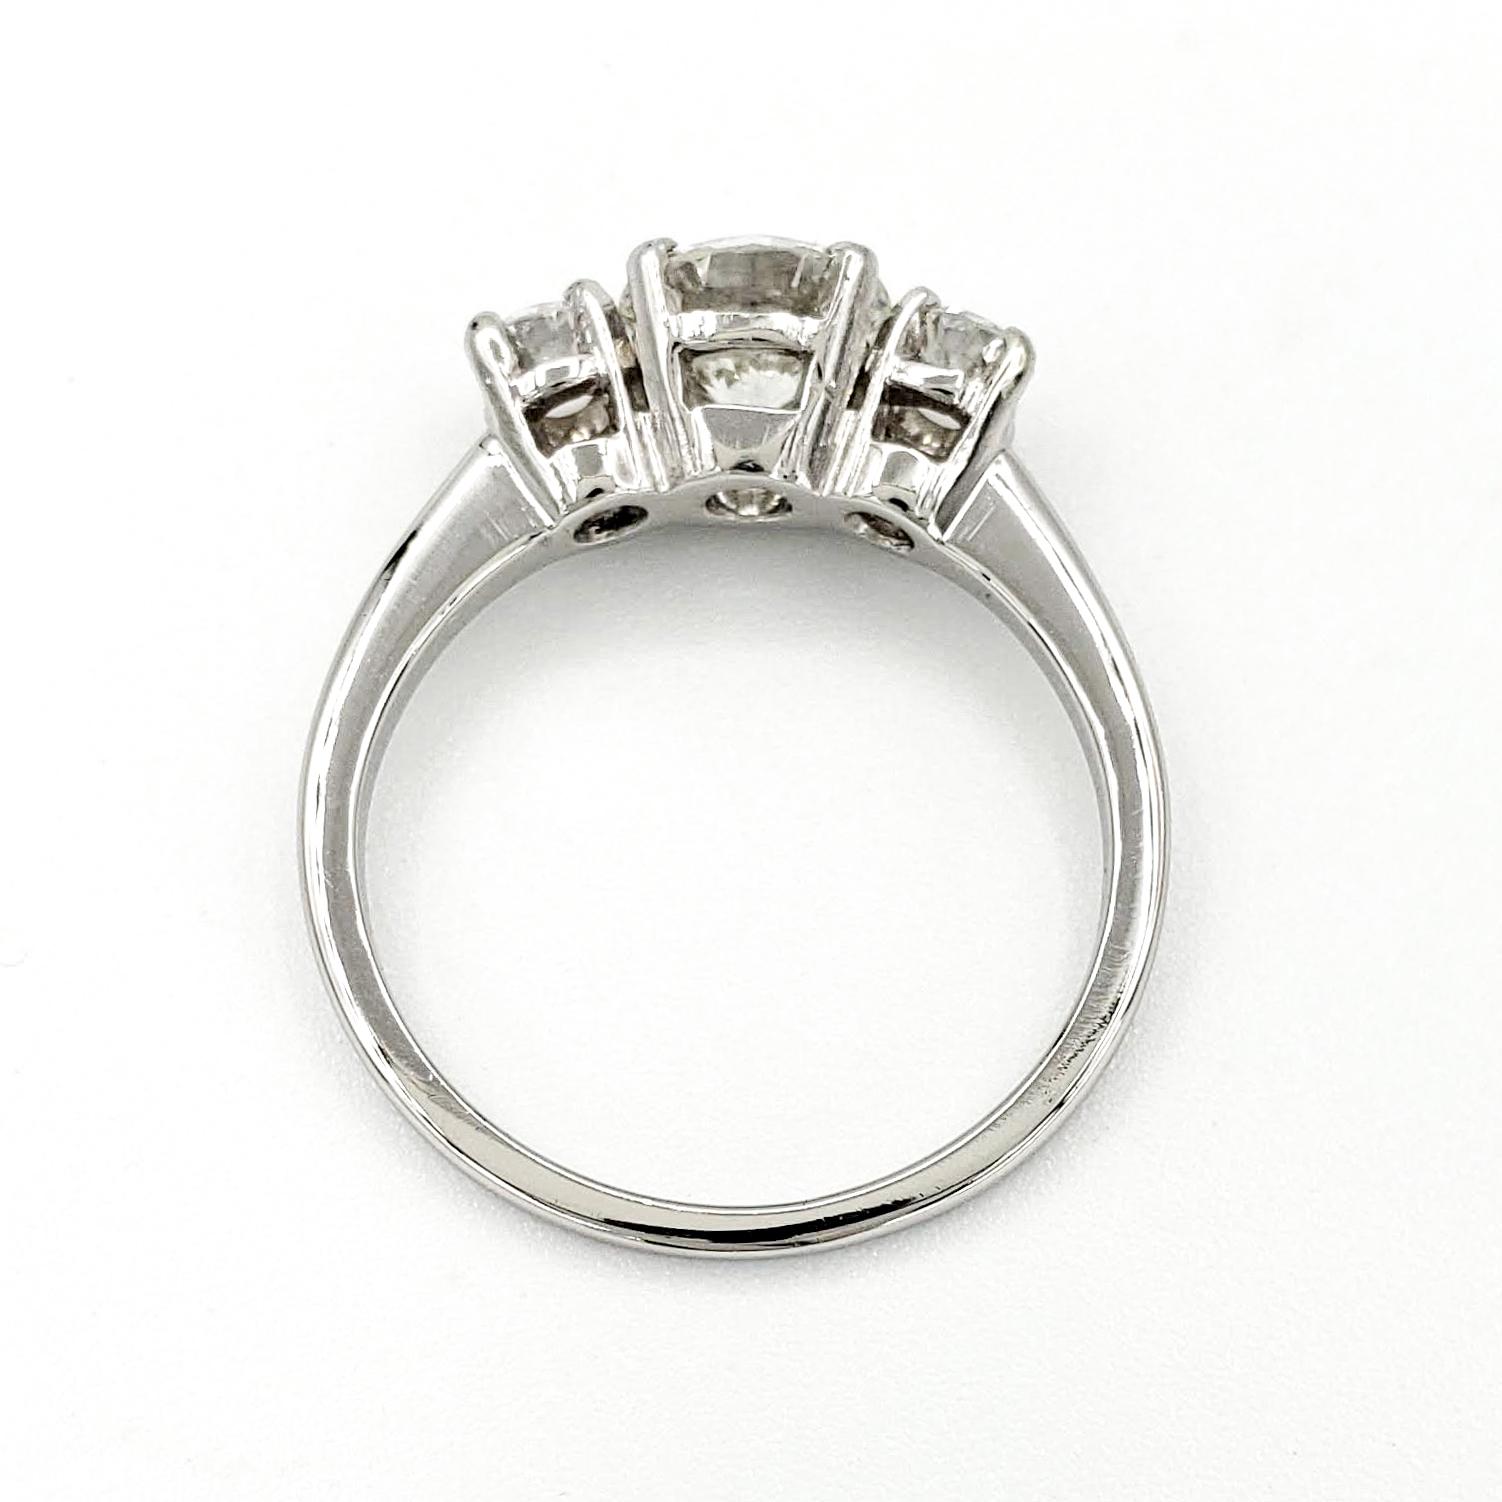 vintage-platinum-engagement-ring-with-1-01-carat-round-brilliant-cut-diamond-gia-j-vs2